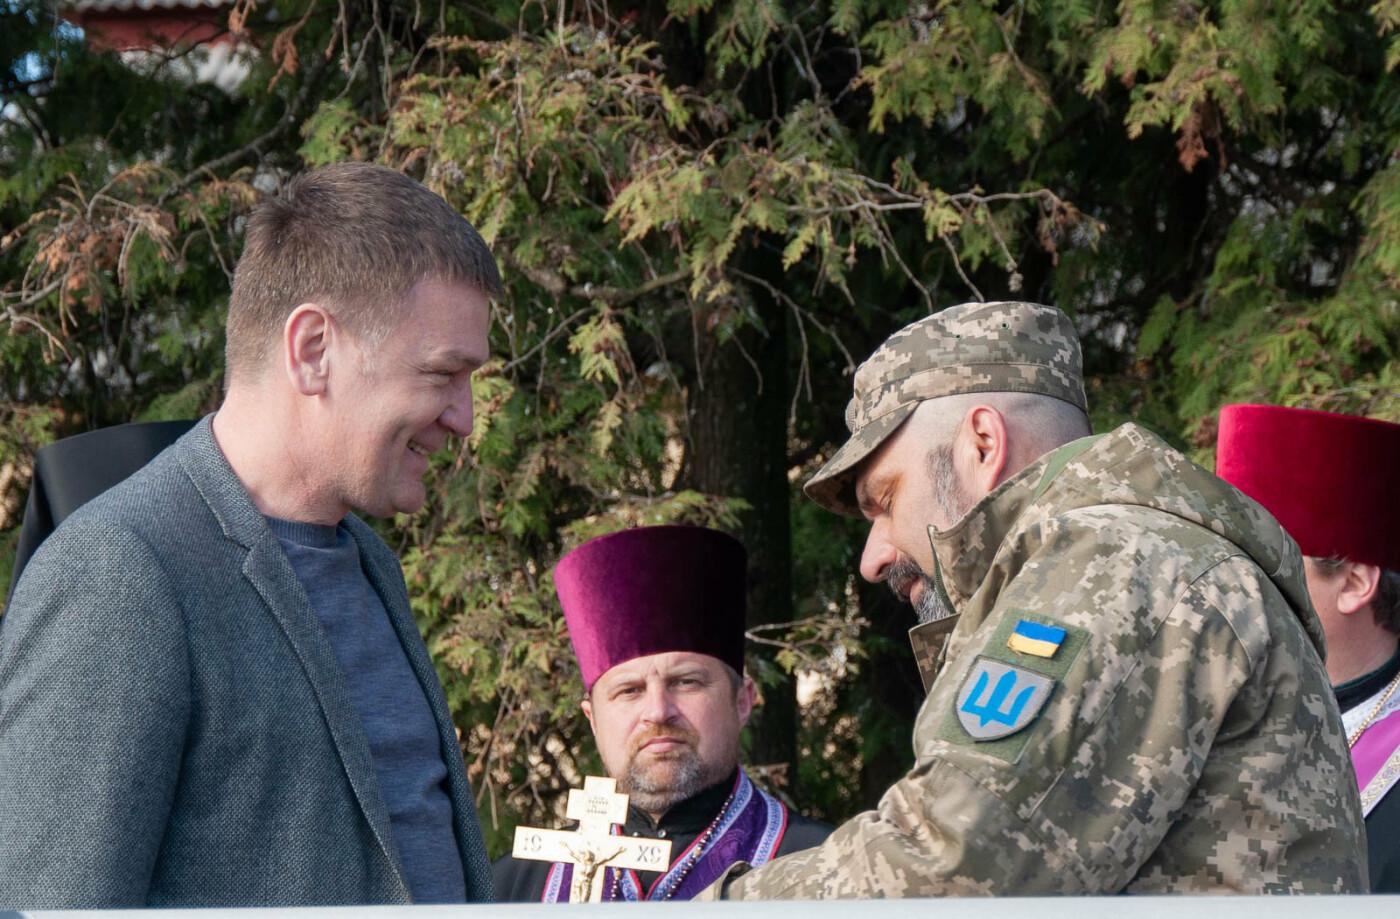 Роберт Горват нагородив Грамотою Верховної Ради України полковника 128-ої ОГПБР Євгена Бондара (ФОТО), фото-5